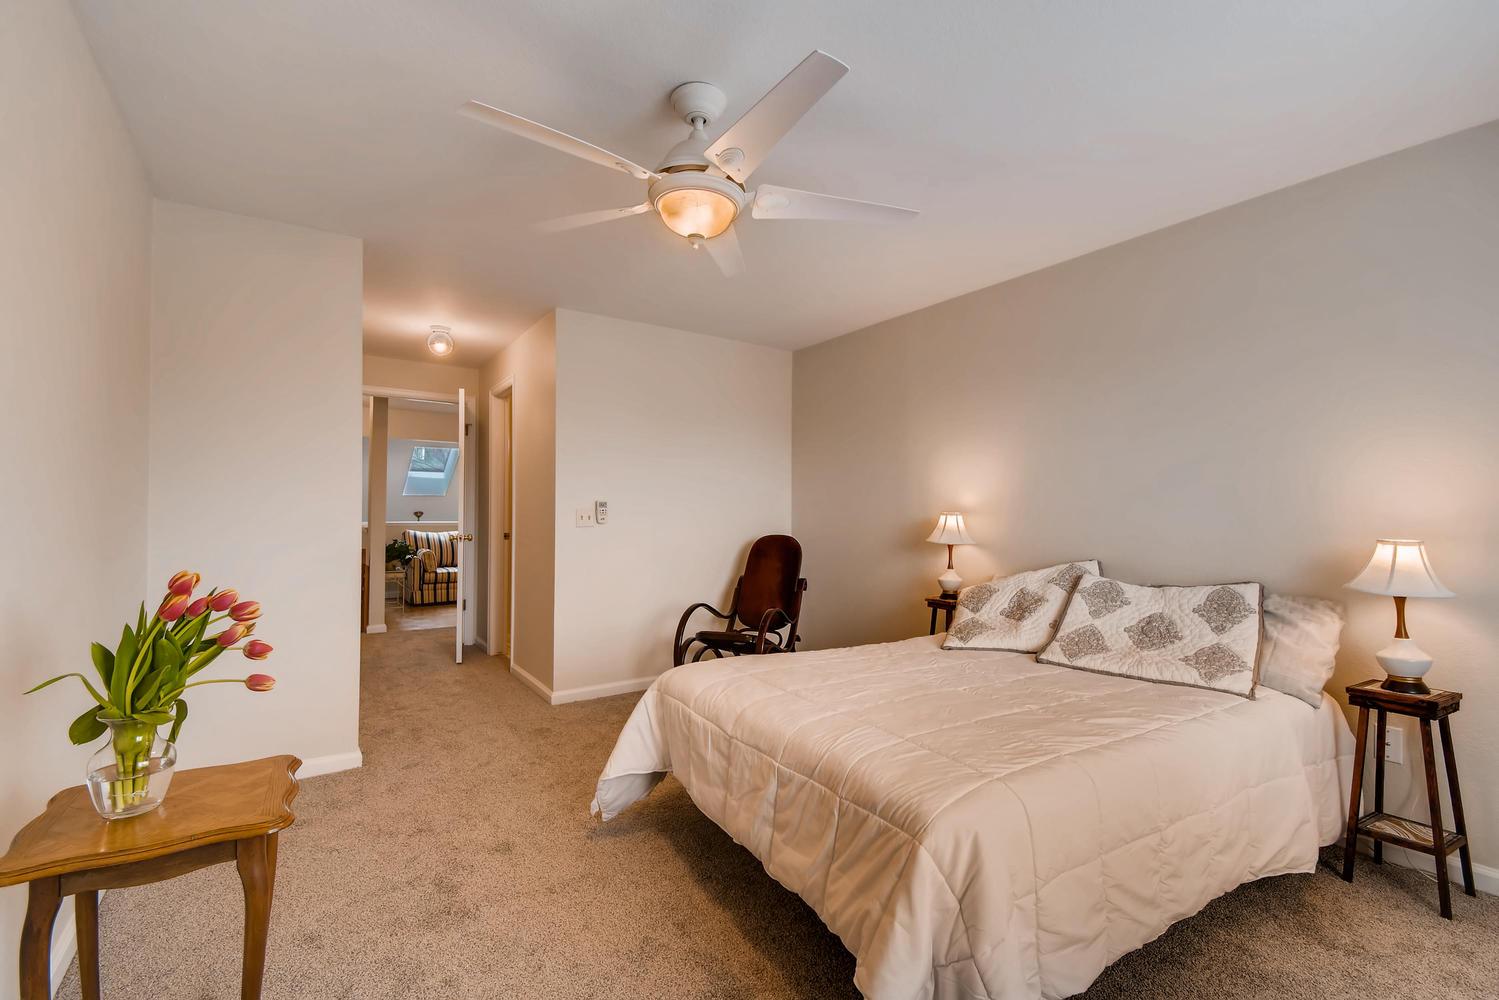 472 Owl Dr Louisville CO 80027-large-014-26-2nd Floor Master Bedroom-1499x1000-72dpi.jpg